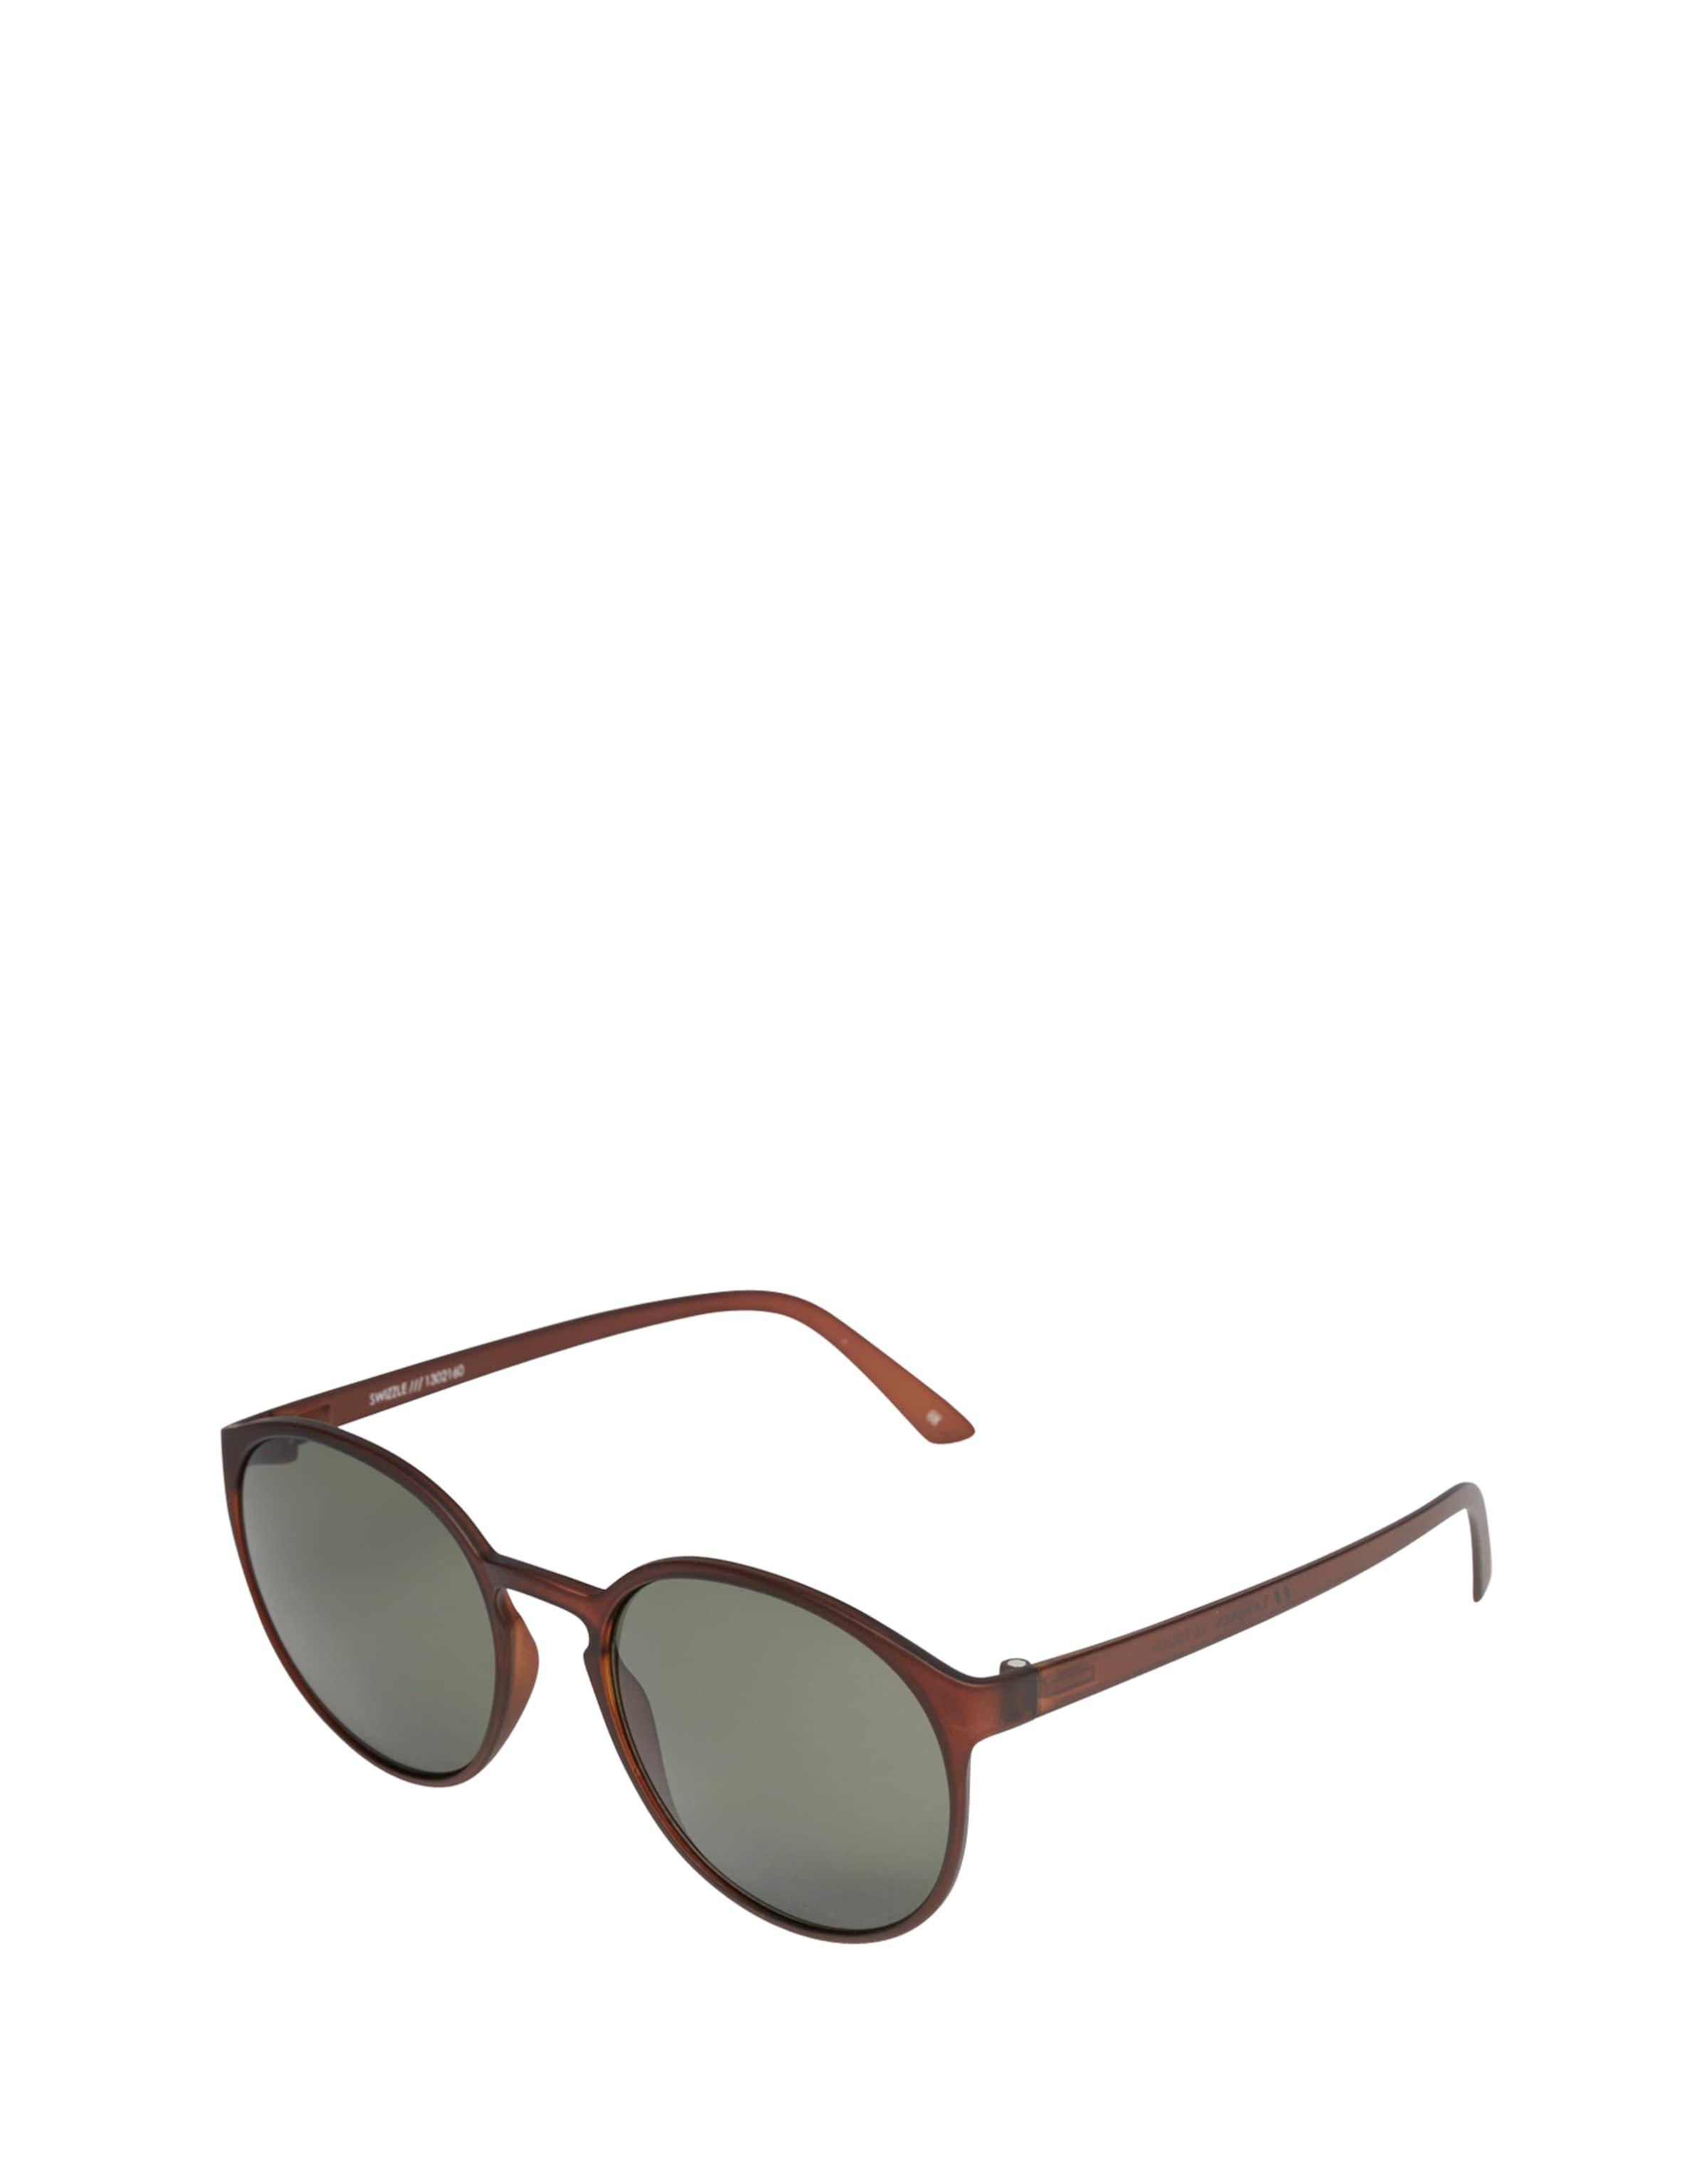 'swizzle' Braun In Sonnenbrille Le Specs Ibvfg6Y7y